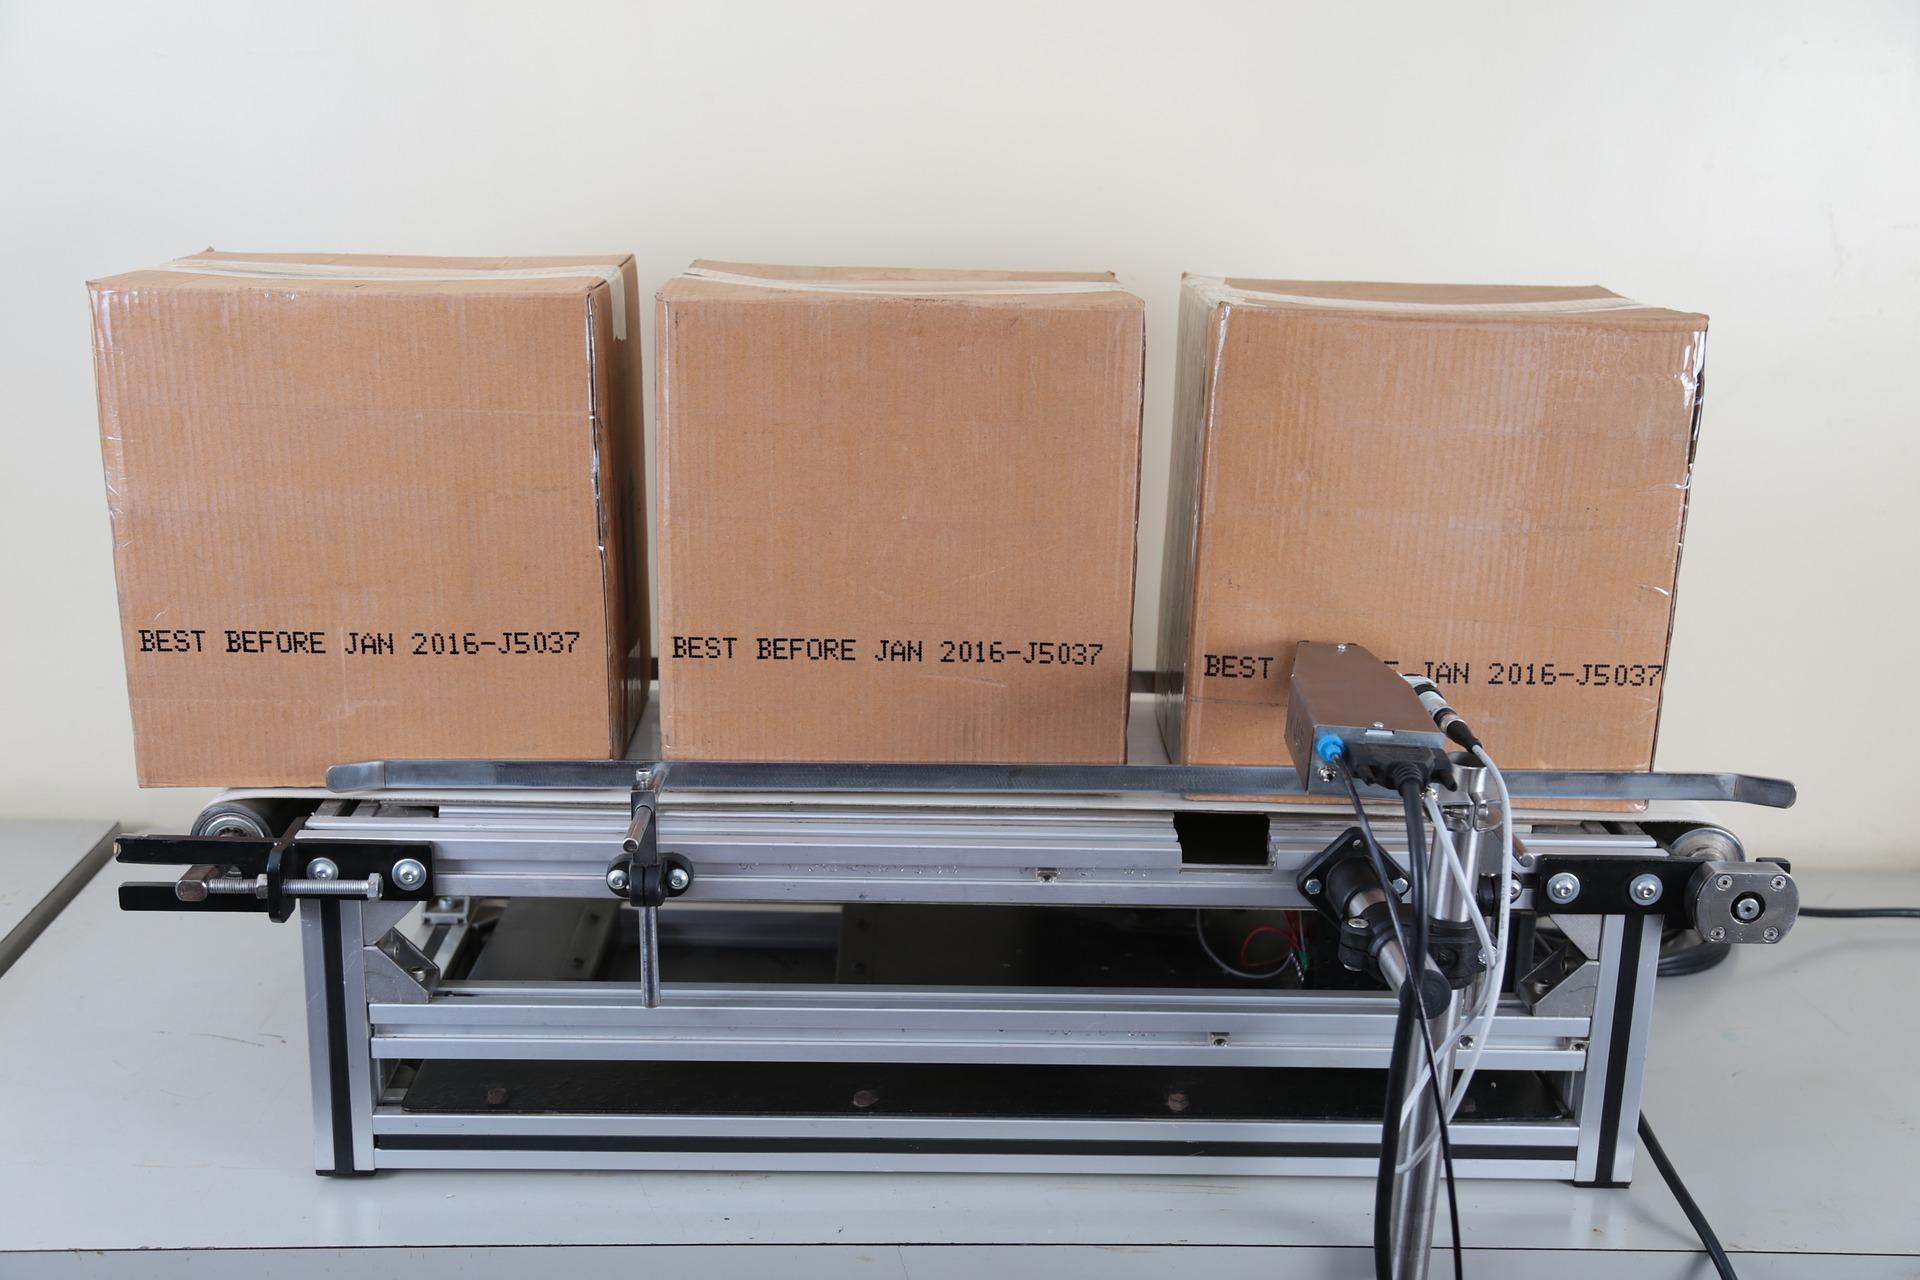 manuelle verpackung